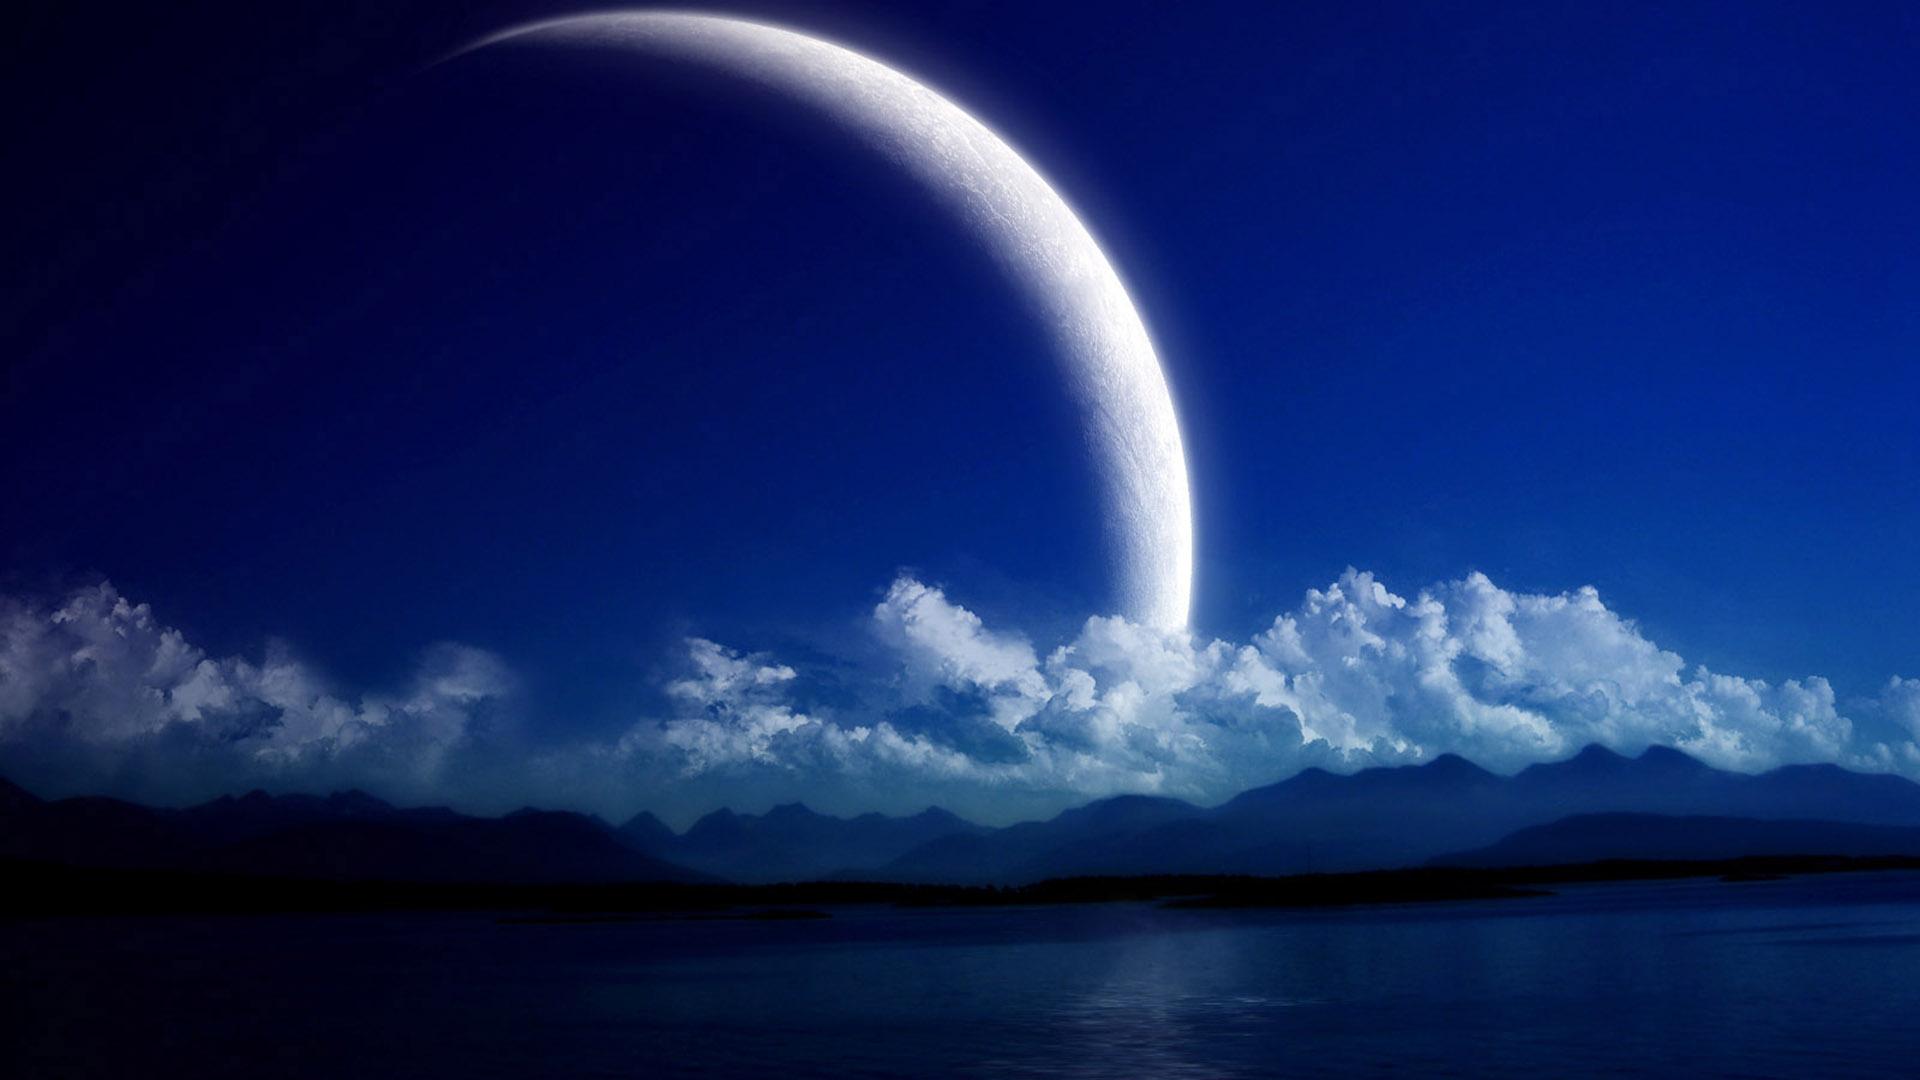 Fond d'ecran Enorme Lune - Wallpaper